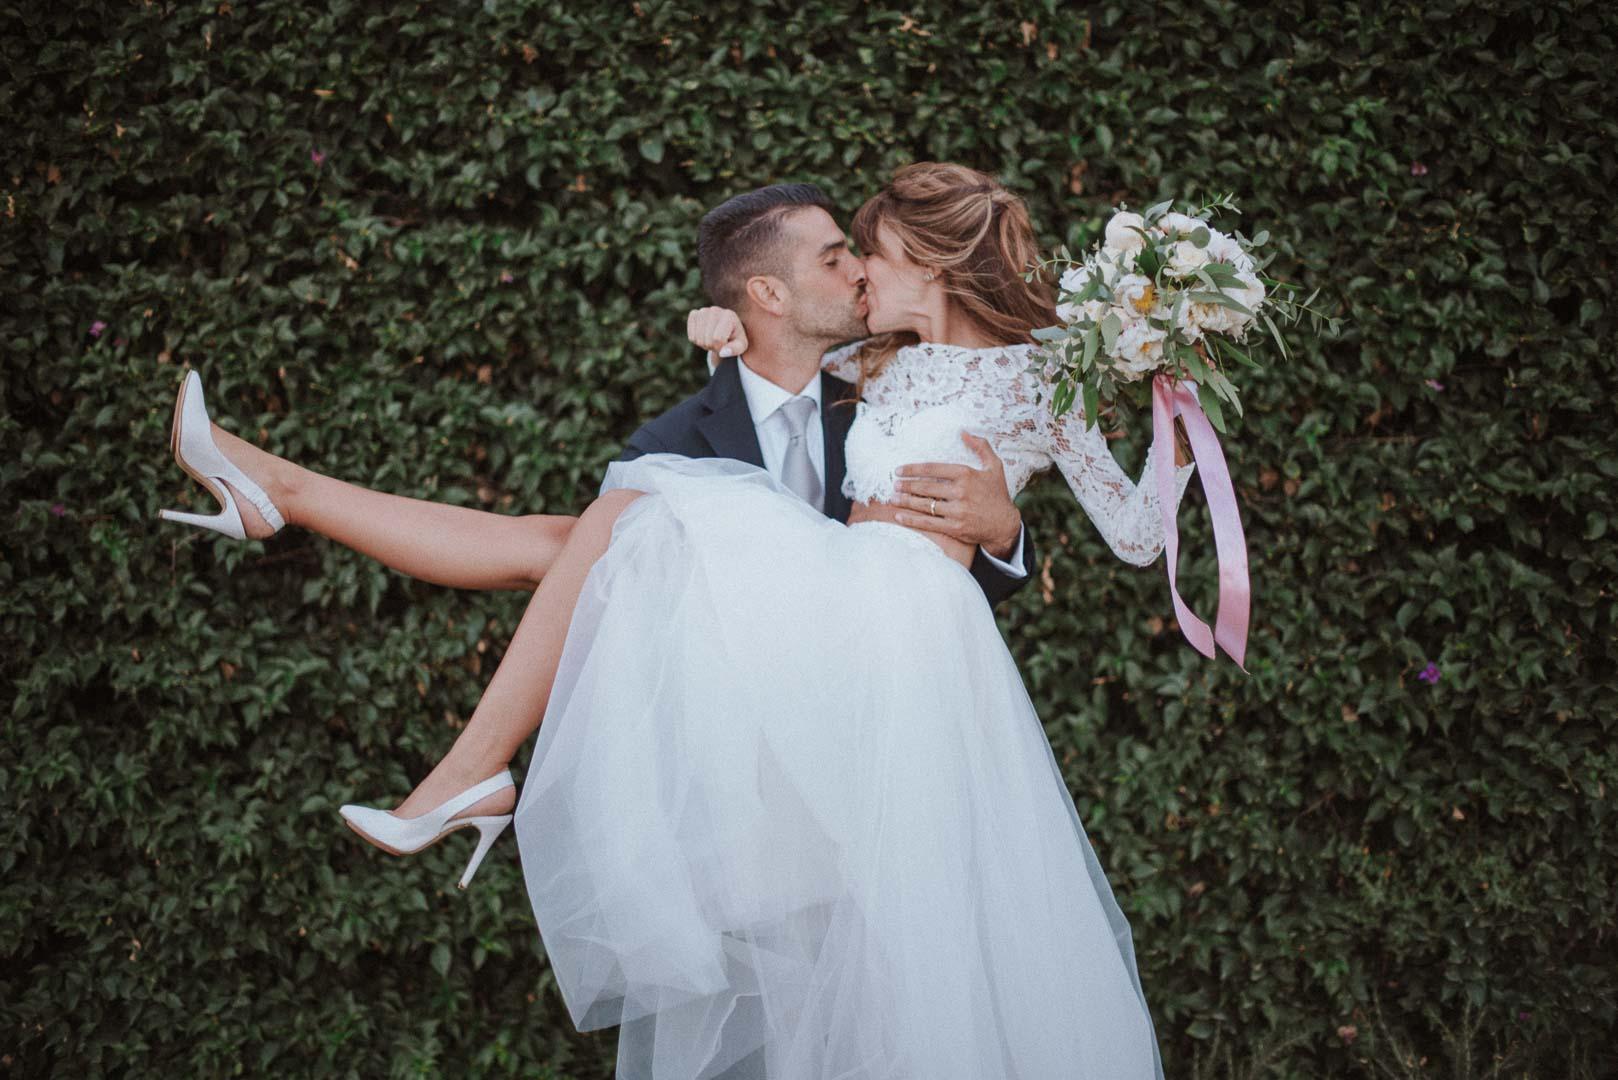 wedding-photographer-destination-fineart-bespoke-reportage-napoli-nabilah-vivianeizzo-spazio46-93